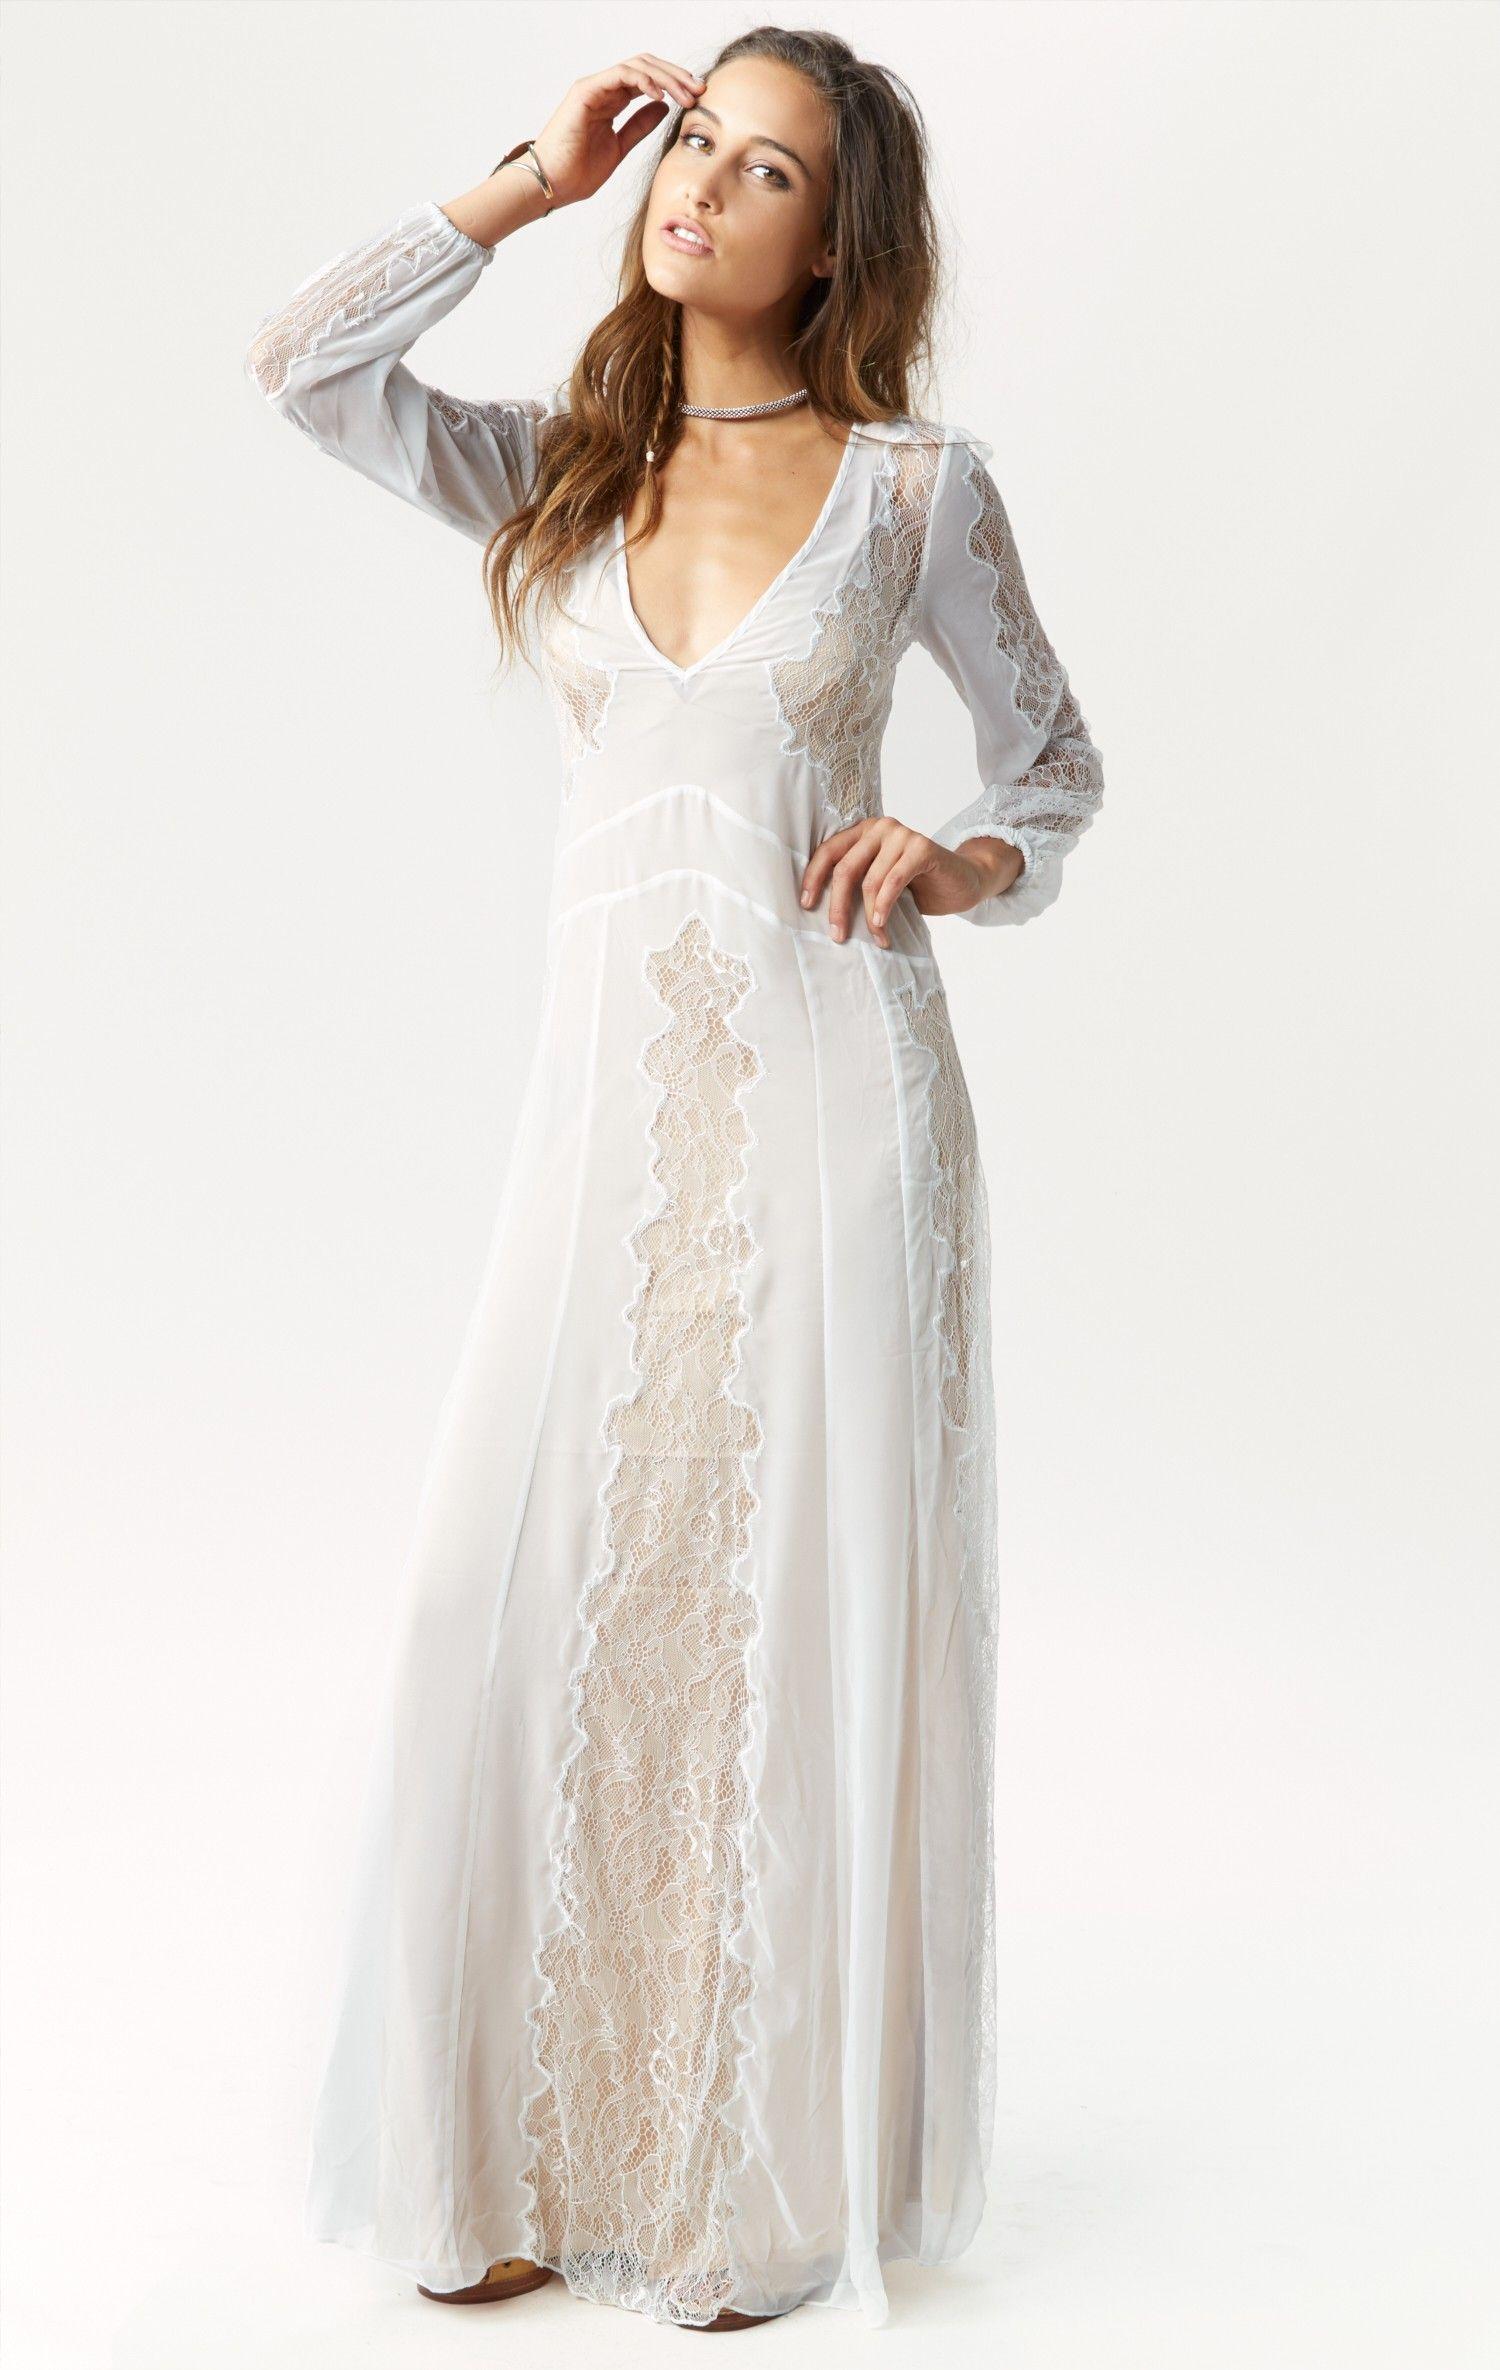 Stone cold fox vermont size 4 wedding dress stone cold fox stone cold fox vermont size 4 wedding dress ombrellifo Choice Image